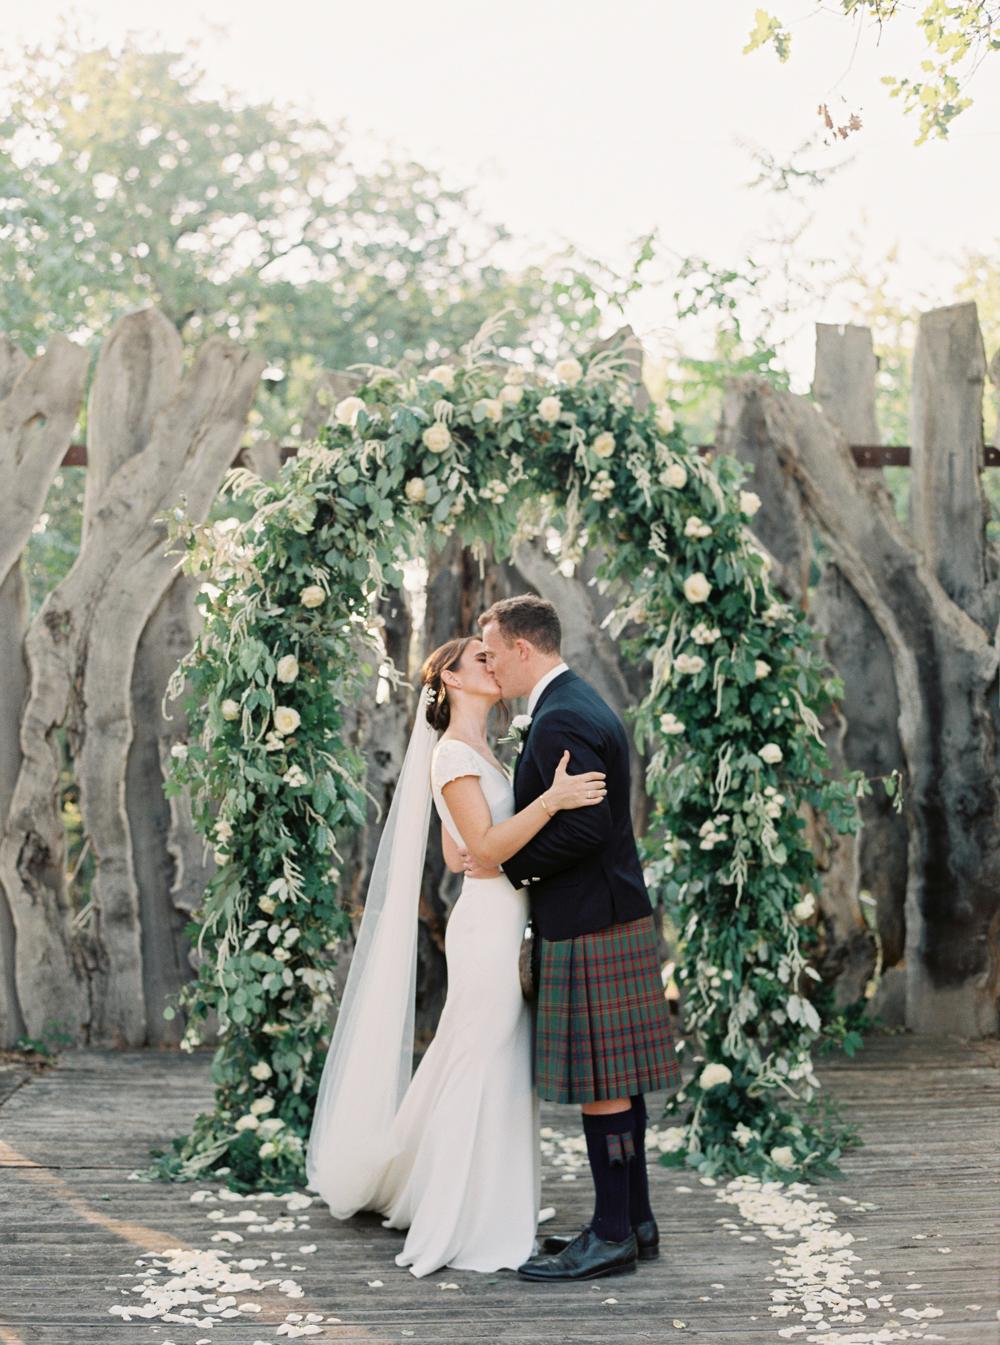 Fiori Wedding.Alice And Tom S Tuscan Villa Wedding Best Wedding Blog